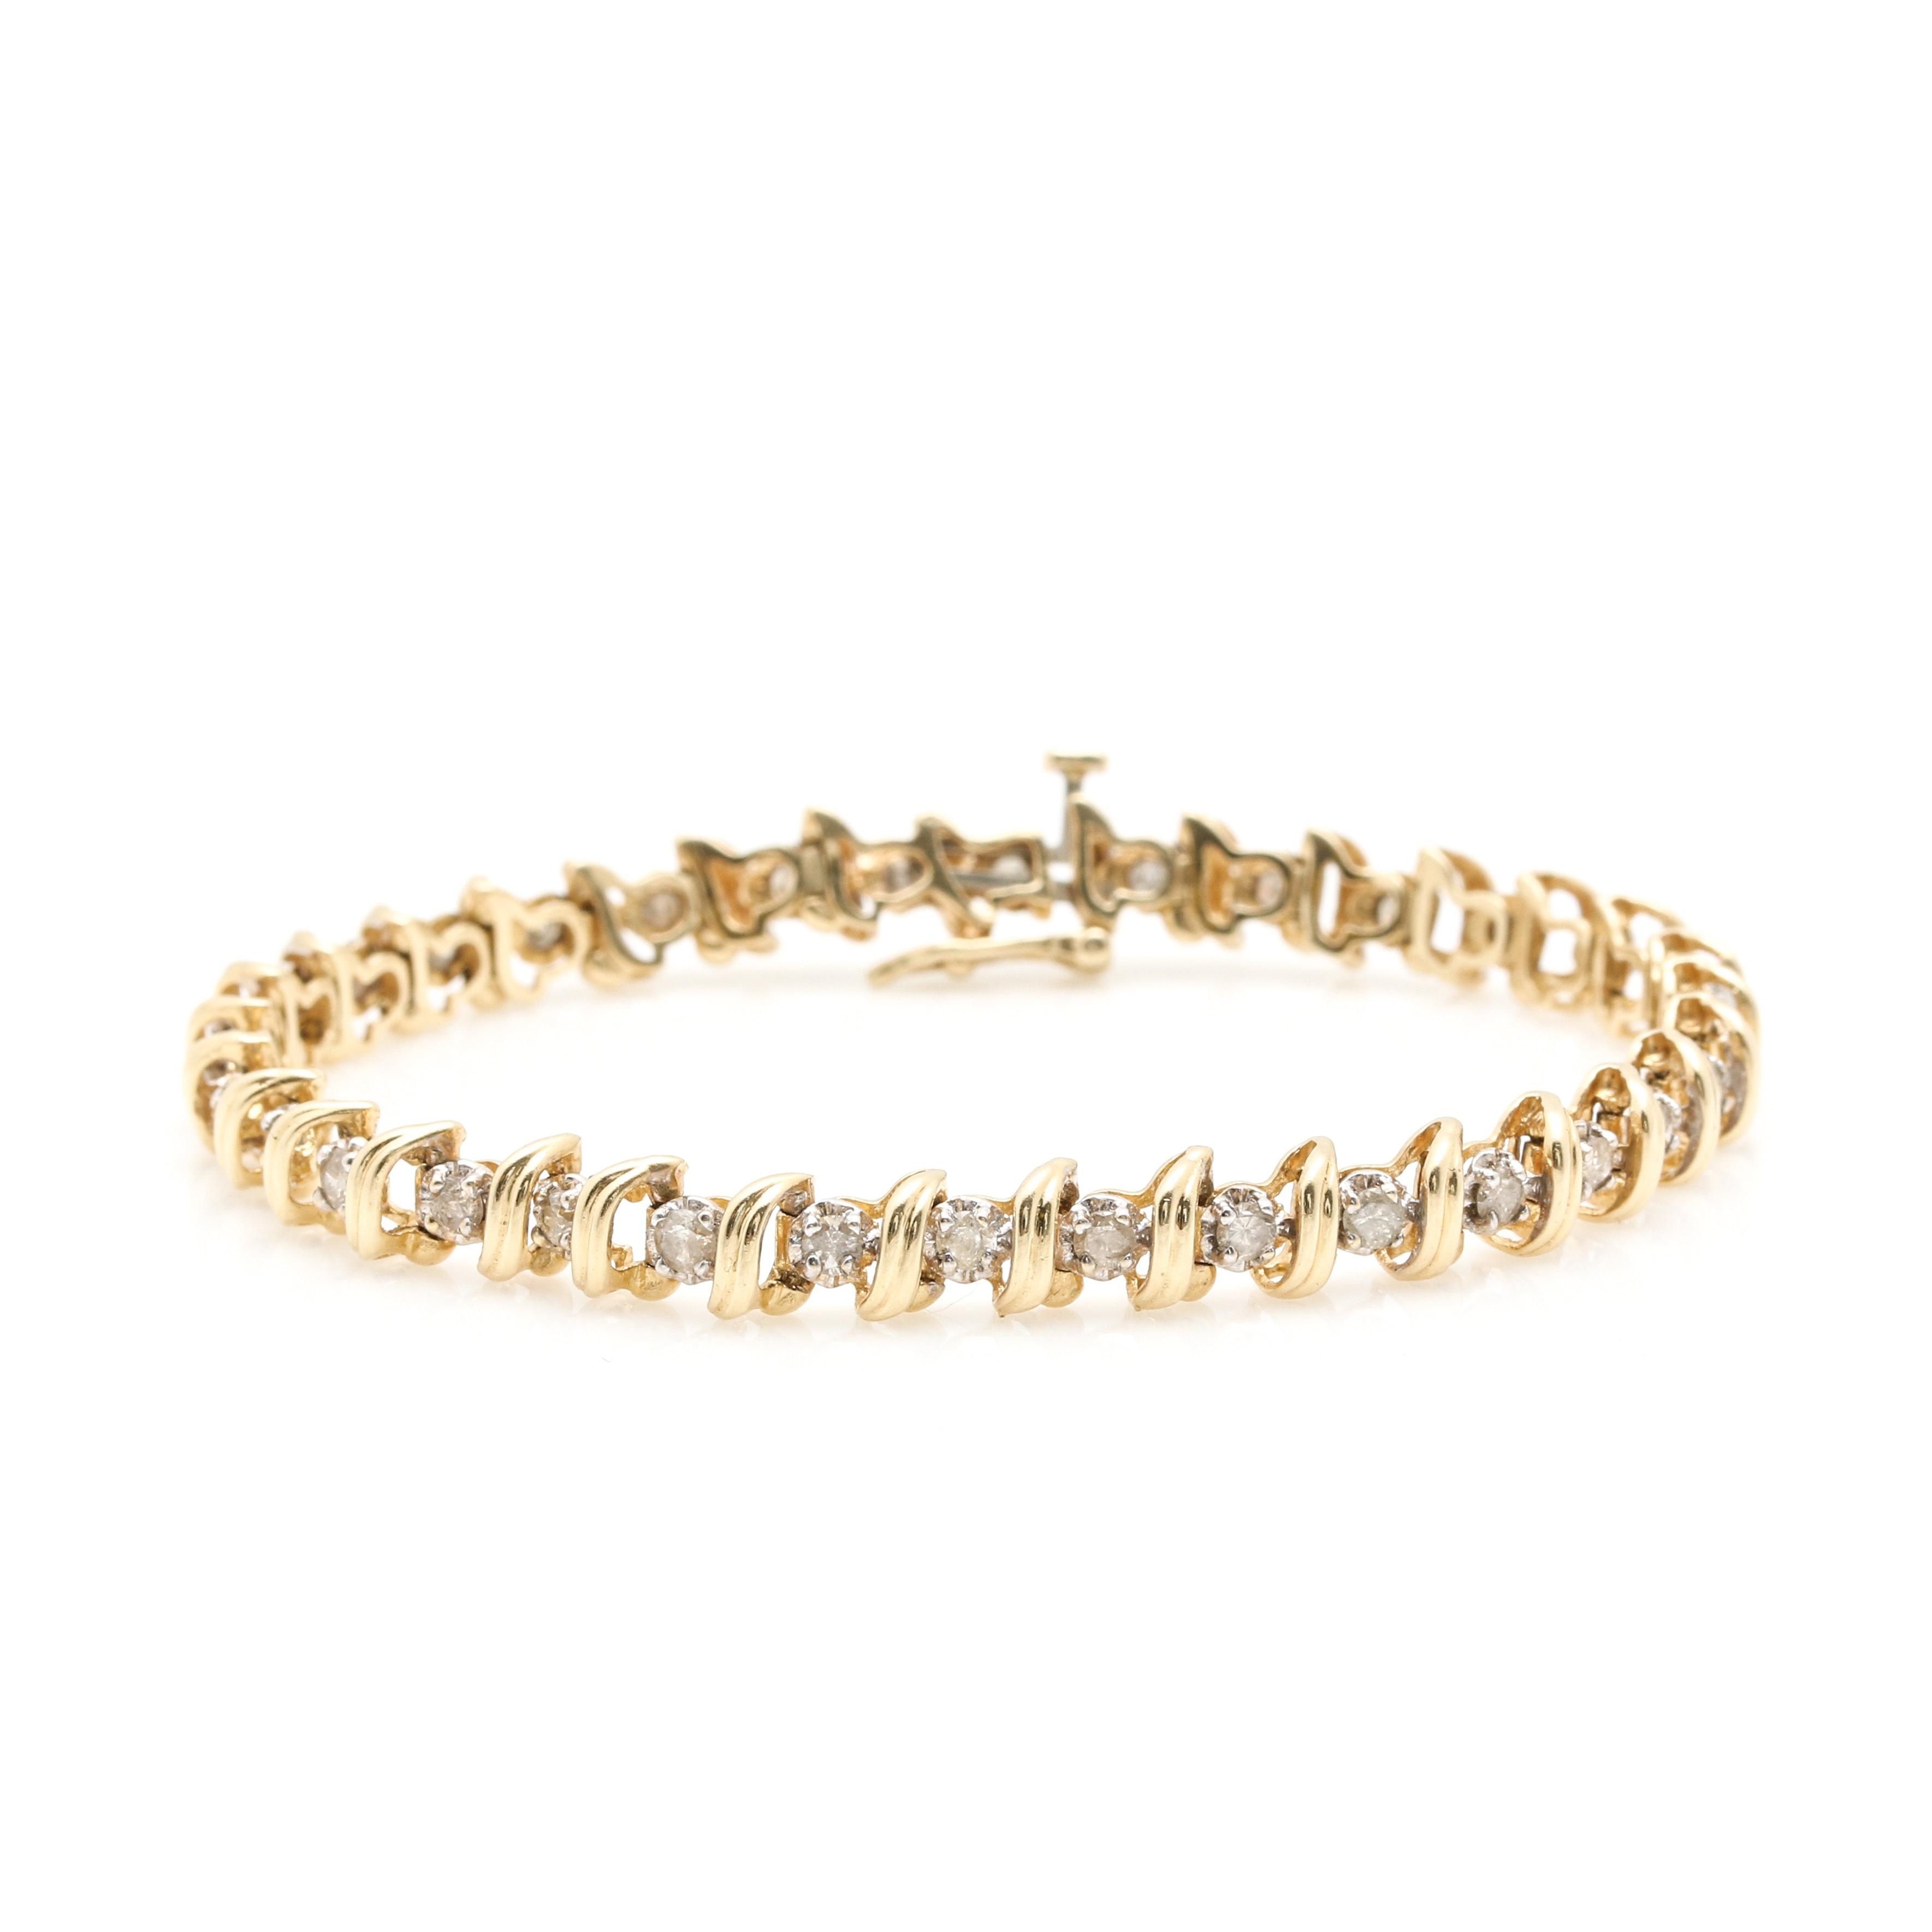 14K Yellow Gold 1.49 CTW Diamond Tennis Bracelet